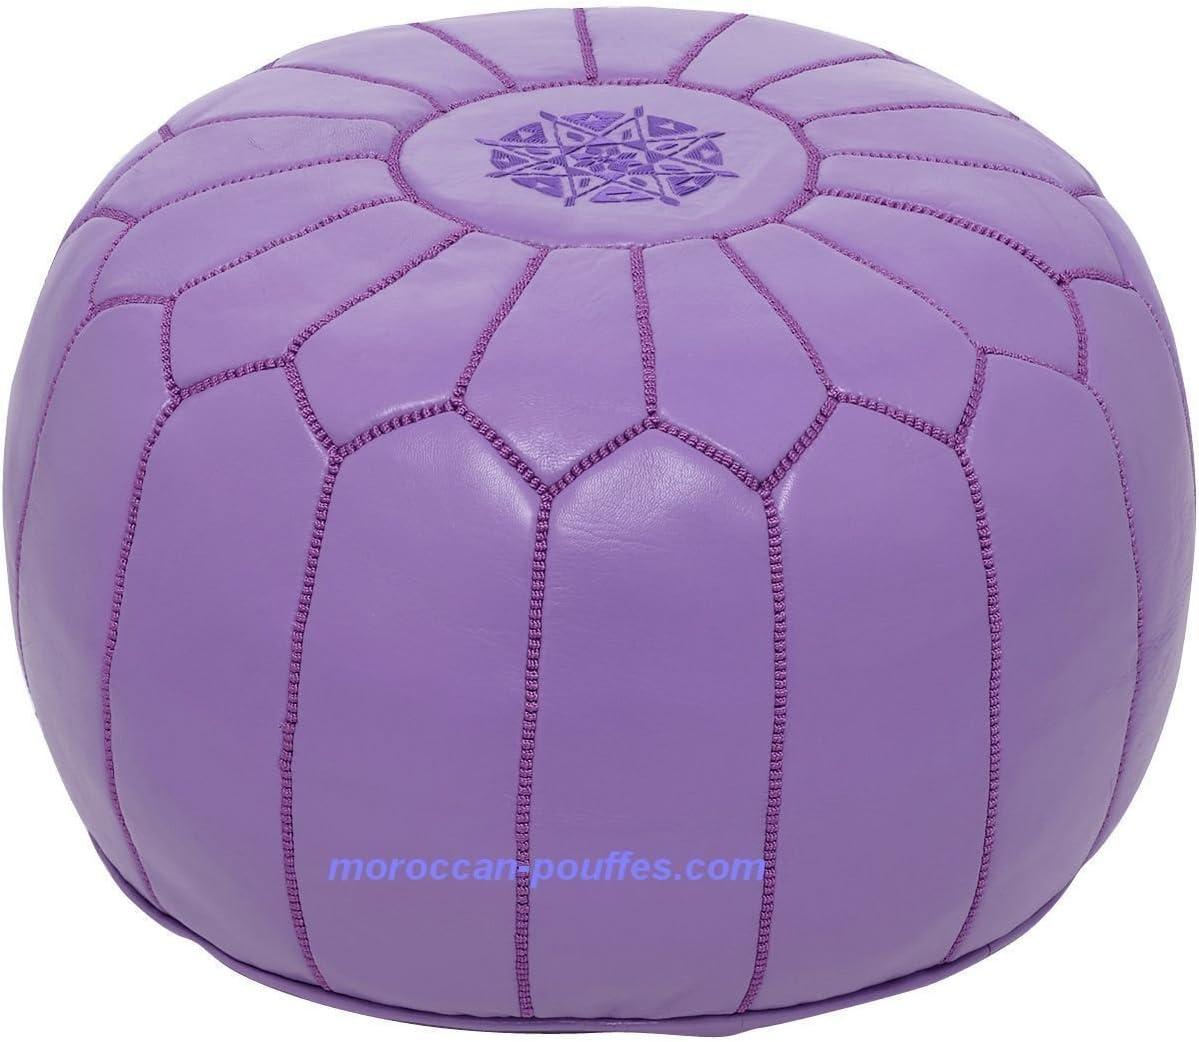 moroccan poufs Leather Luxury Ottomans Footstools Purple Unstuffed